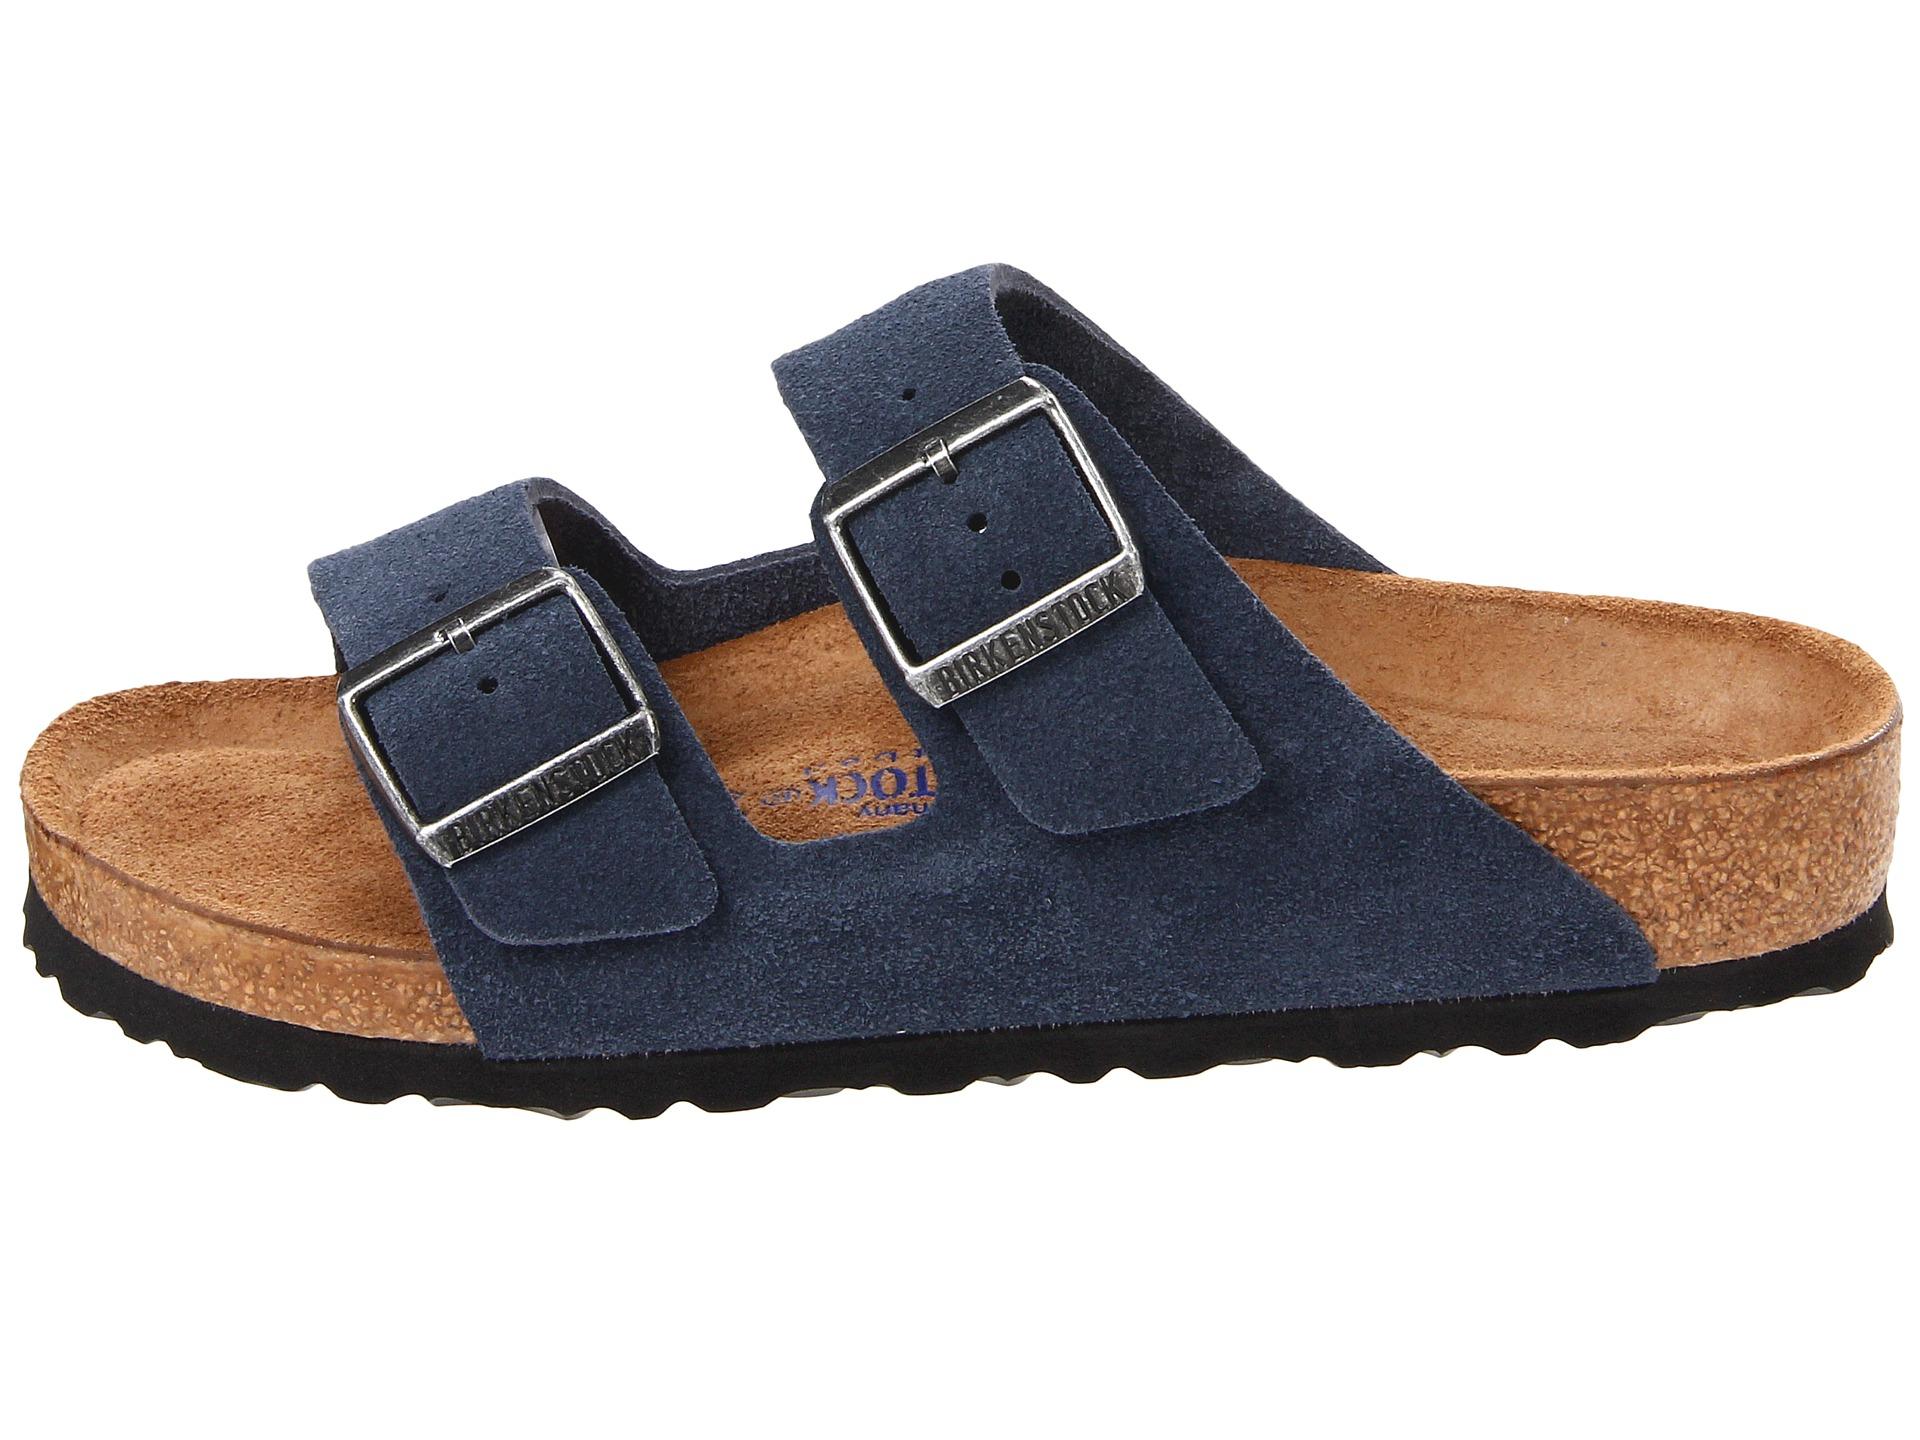 Lyst - Birkenstock Arizona Soft Footbed - Suede in Blue